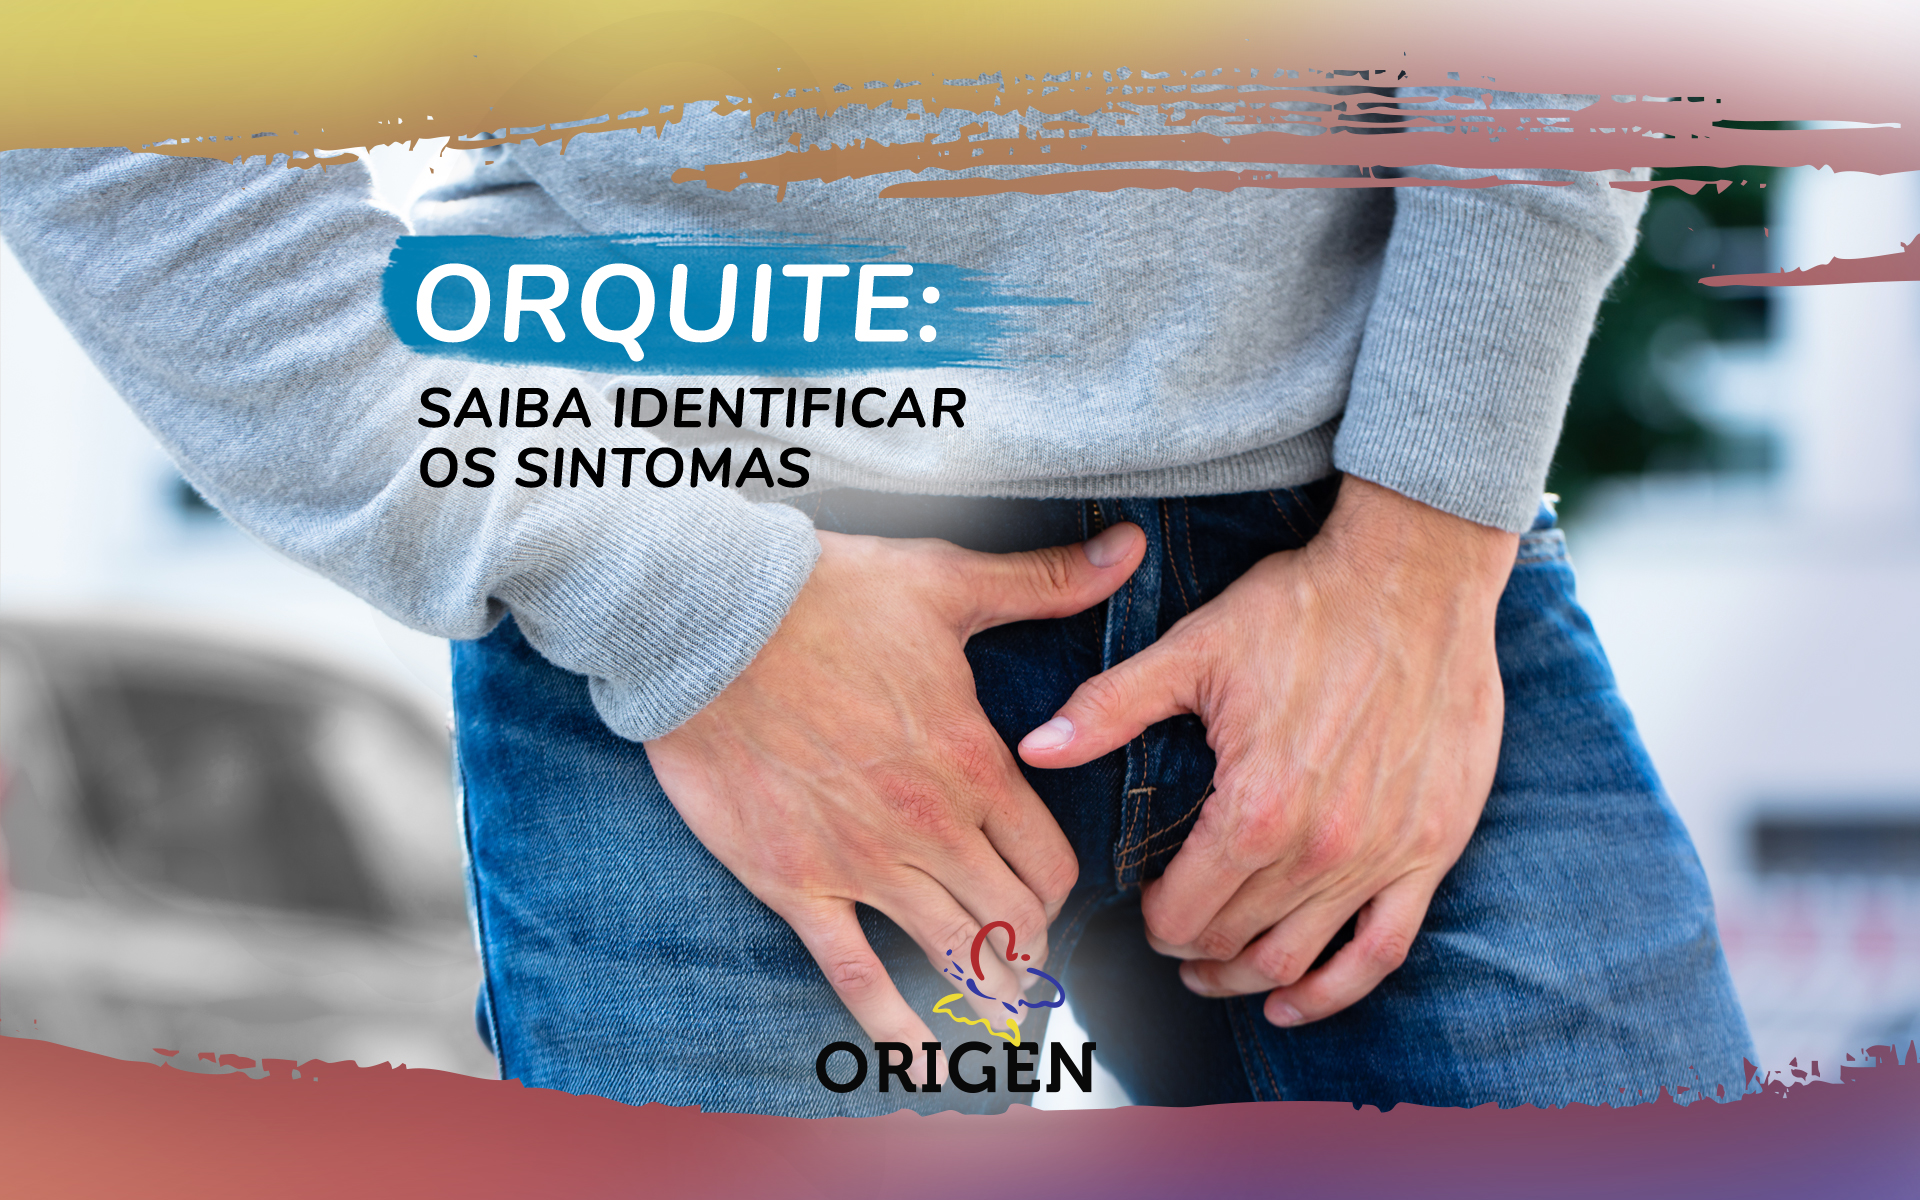 Orquite: saiba identificar os sintomas